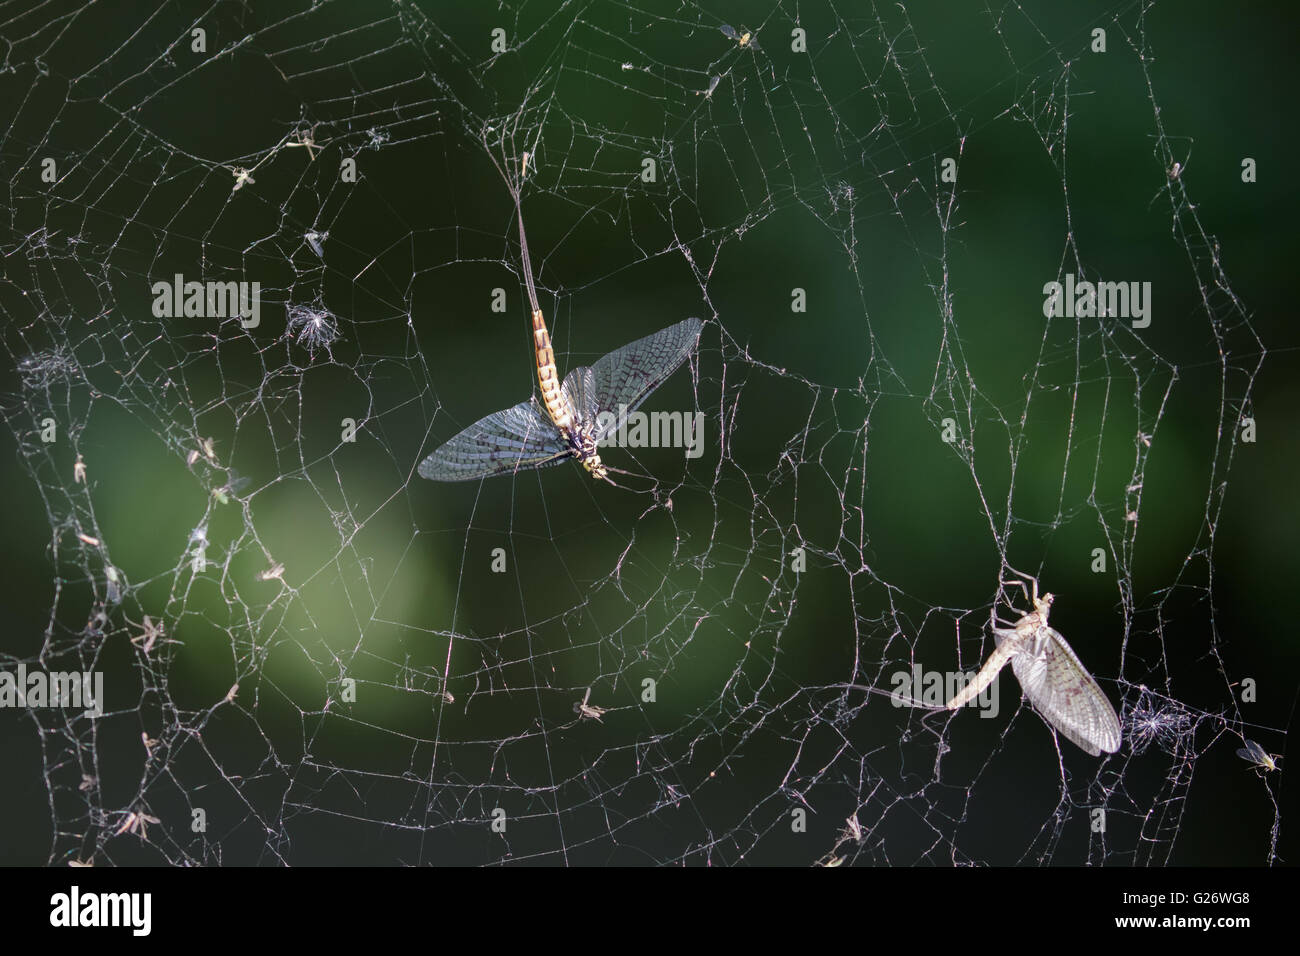 Dead Mayflies (Ephemera vulgata) caught in a damaged spiders web. - Stock Image